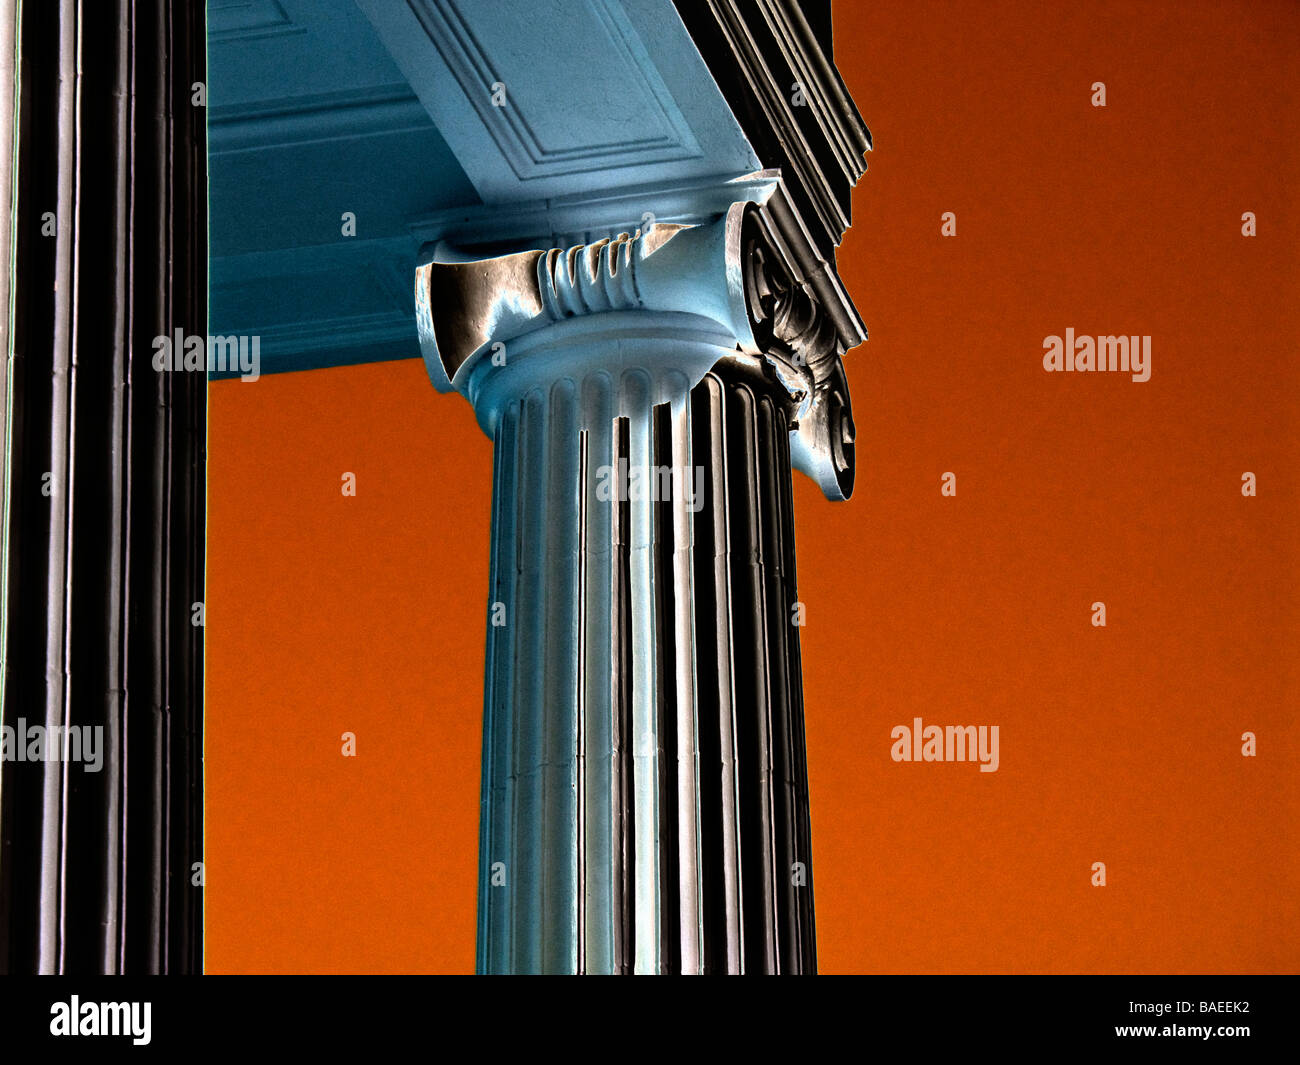 computer enhanced Corinthian style columns - Stock Image